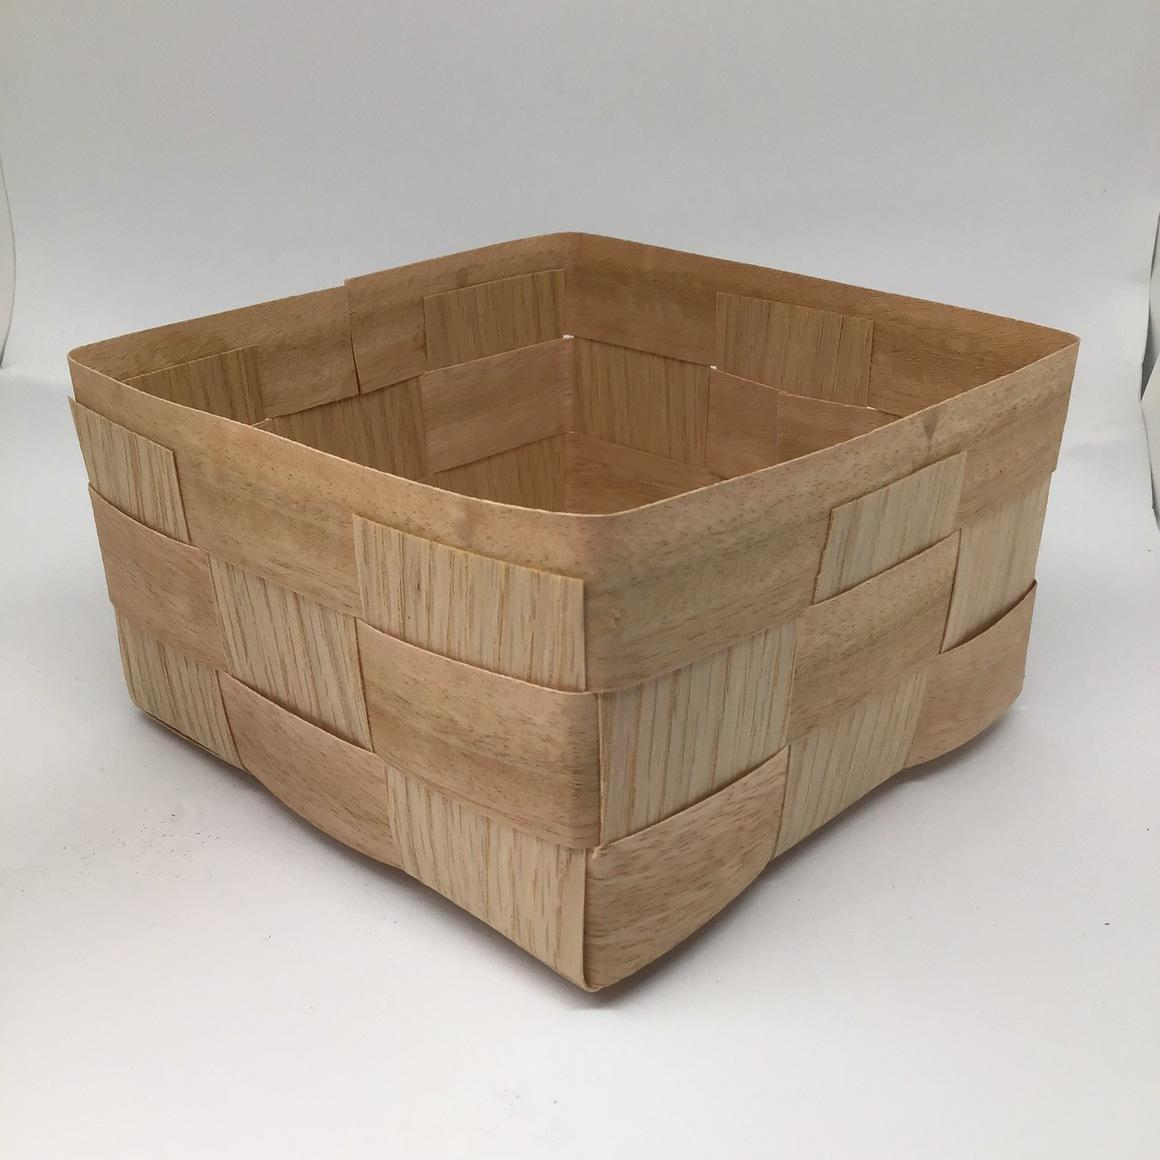 Standard Hamper (16x16x9cm) Various timber veneers, oak, walnut stain. Gift, Hamper | Trada Marketplace